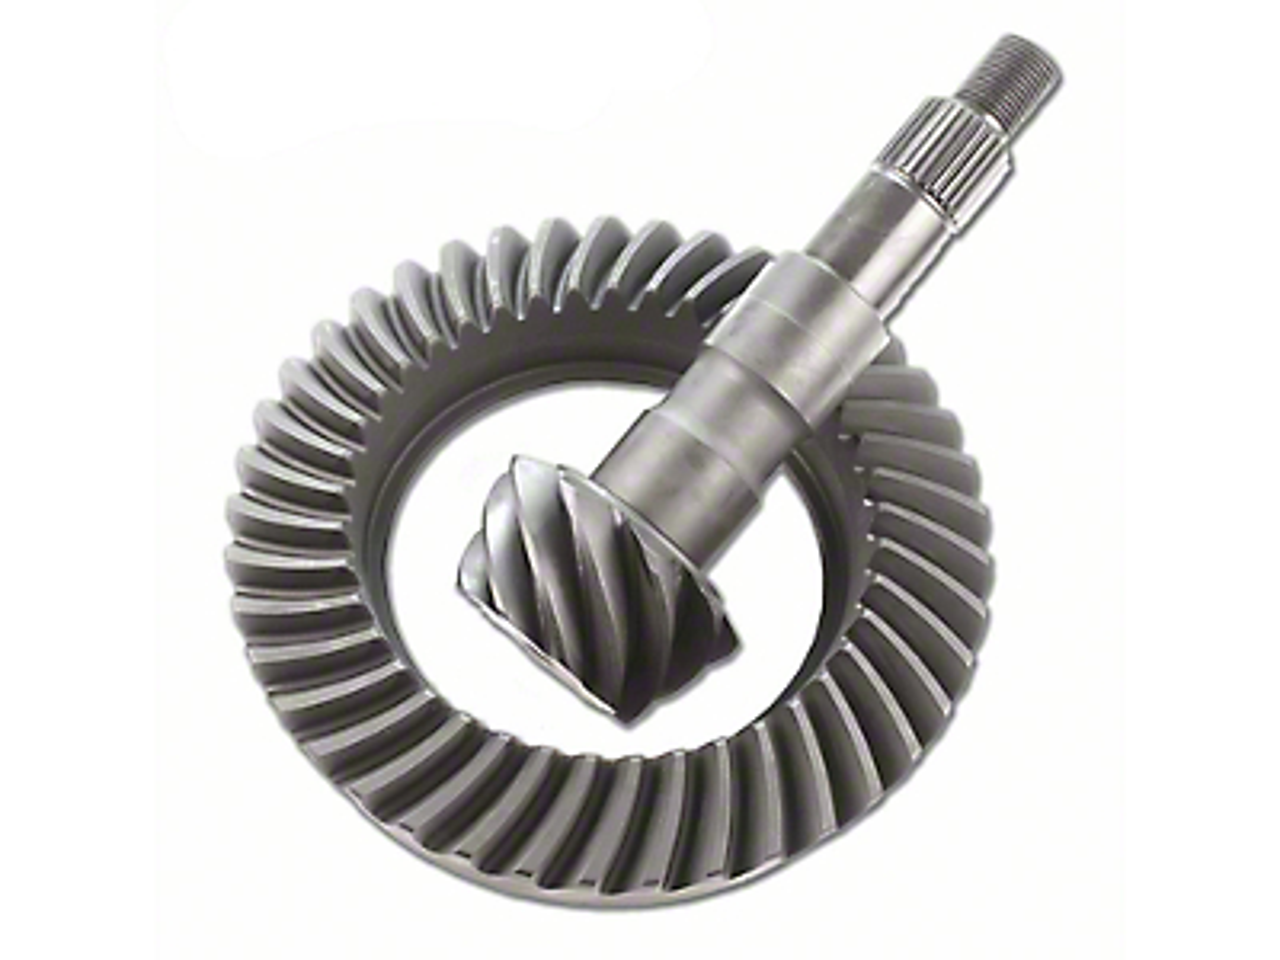 Motive Performance 8.5 in. & 8.6 in. Rear Ring Gear and Pinion Kit - 4.10 Gears (07-18 Sierra 1500)